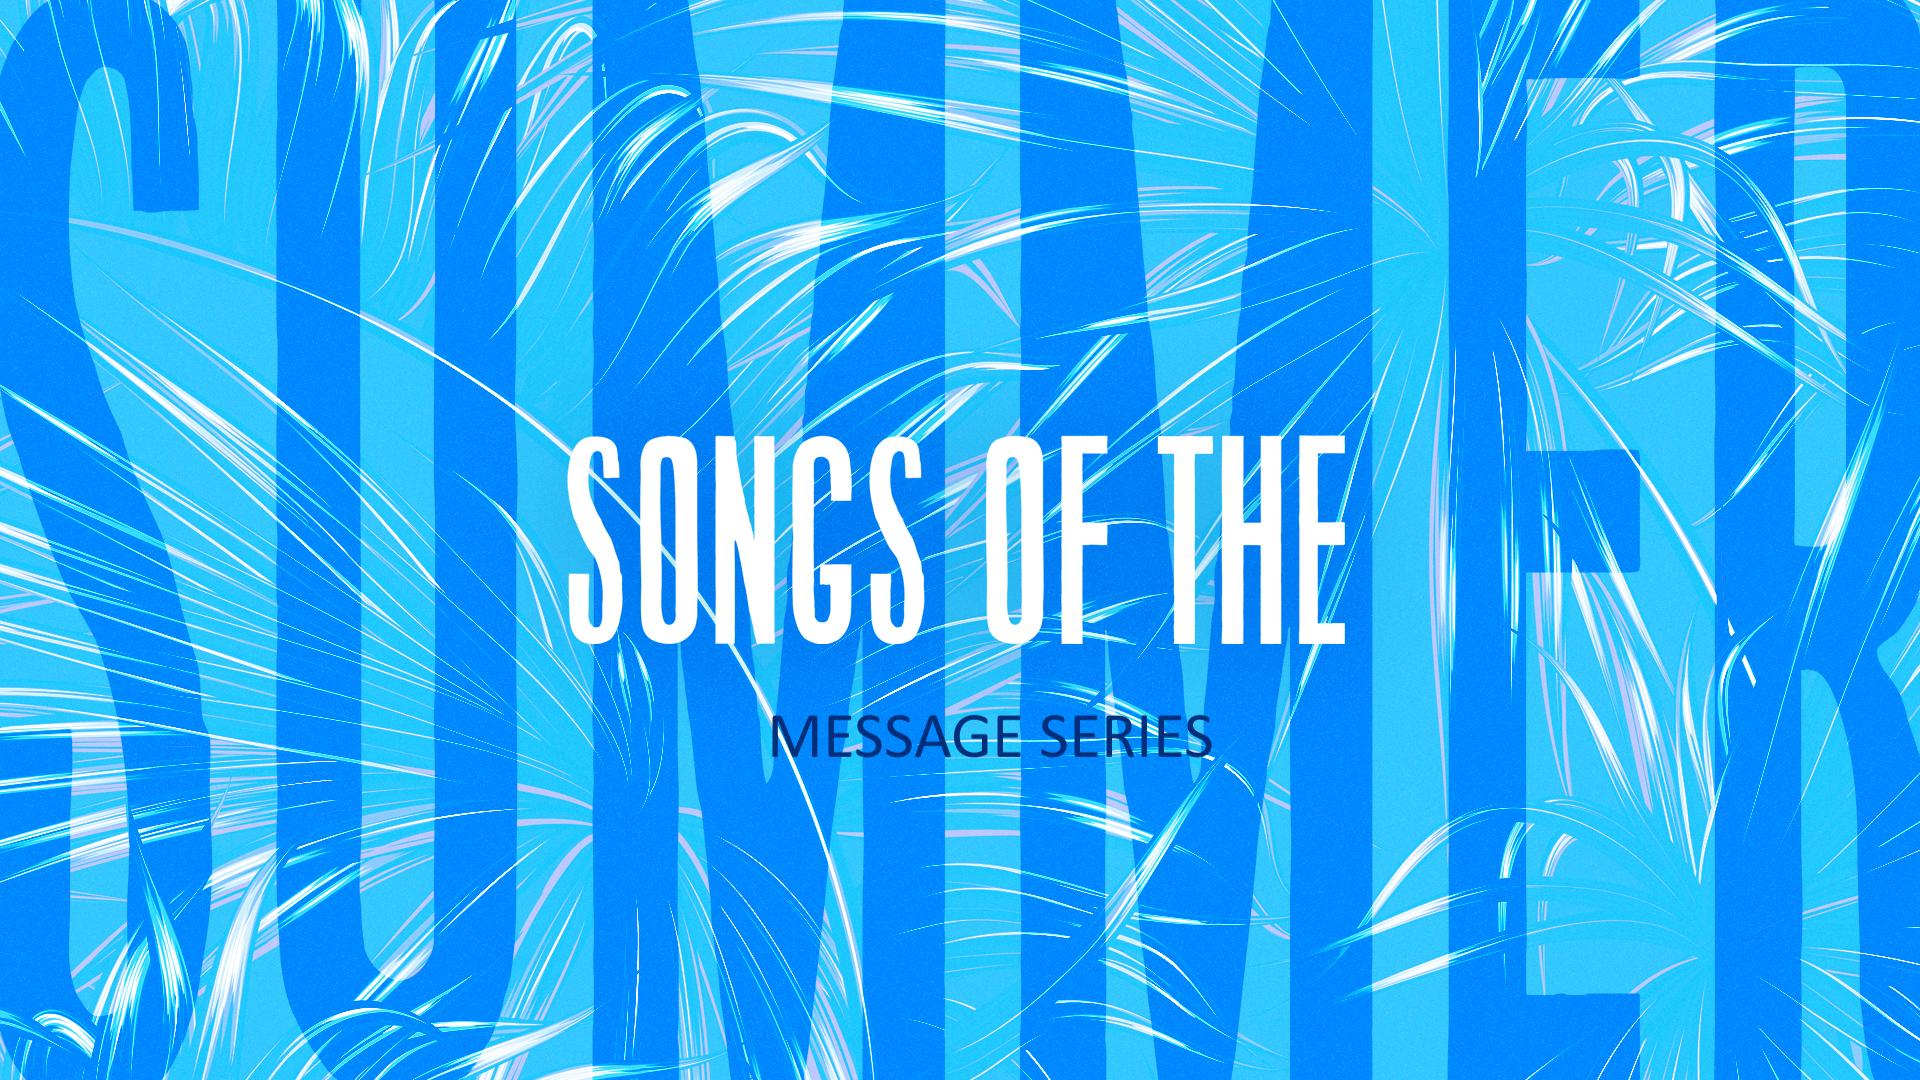 Songs-Of-The-Summer_Title-Slide copy.jpg